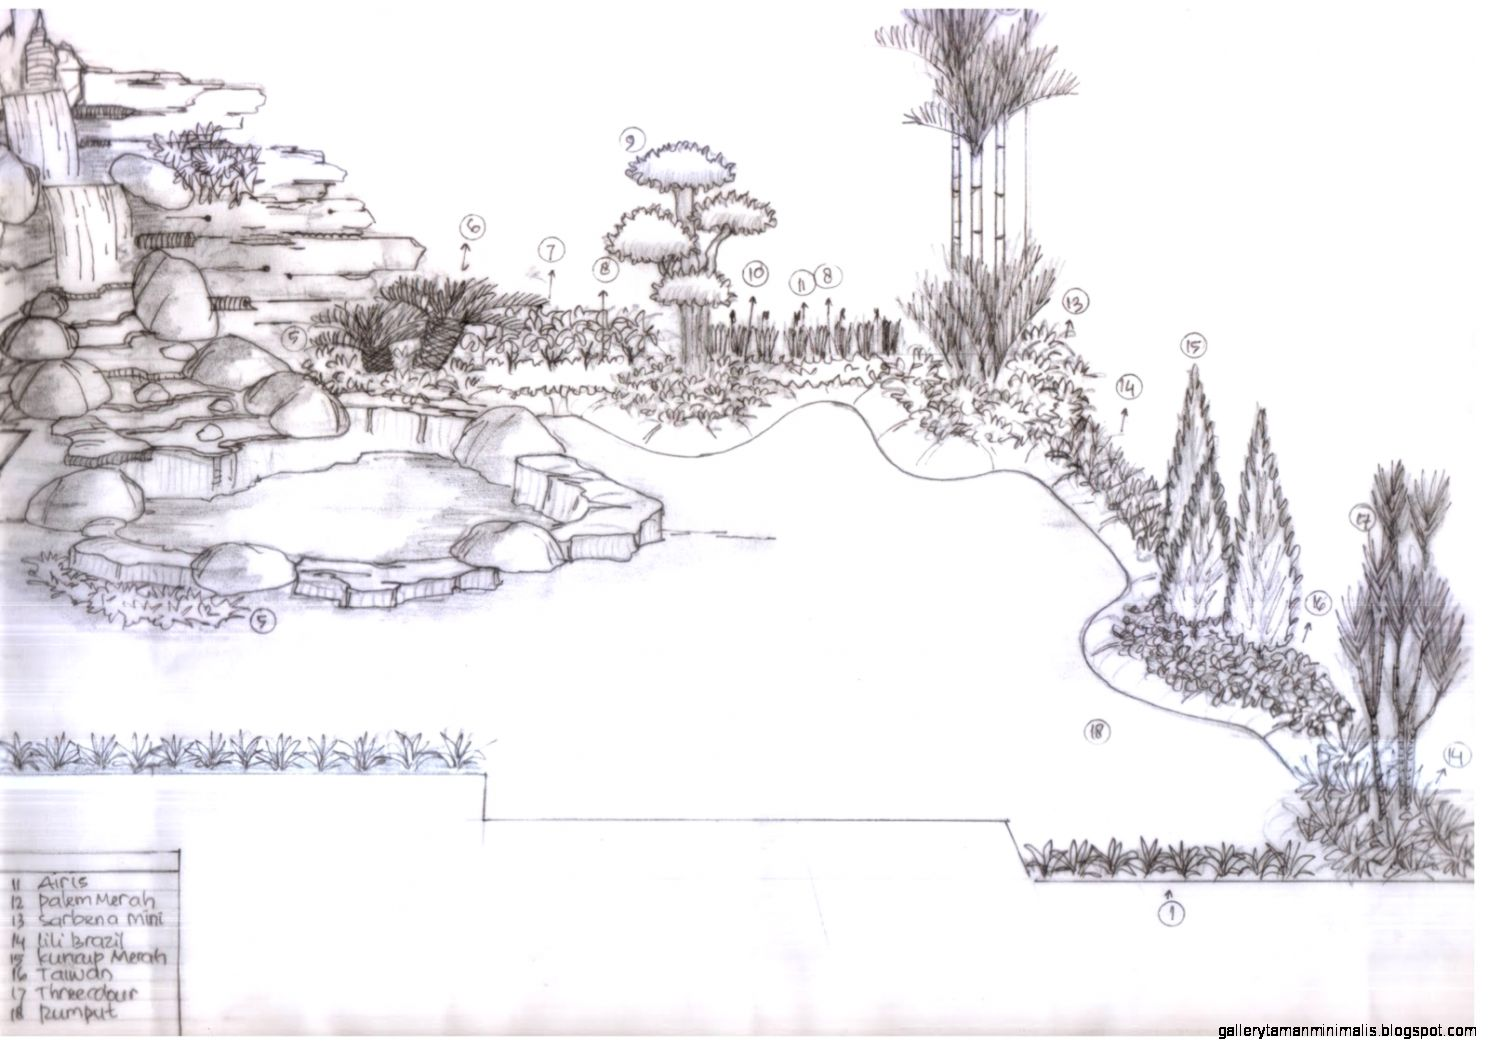 Kumpulan Gambar Sketsa Pohon Taman